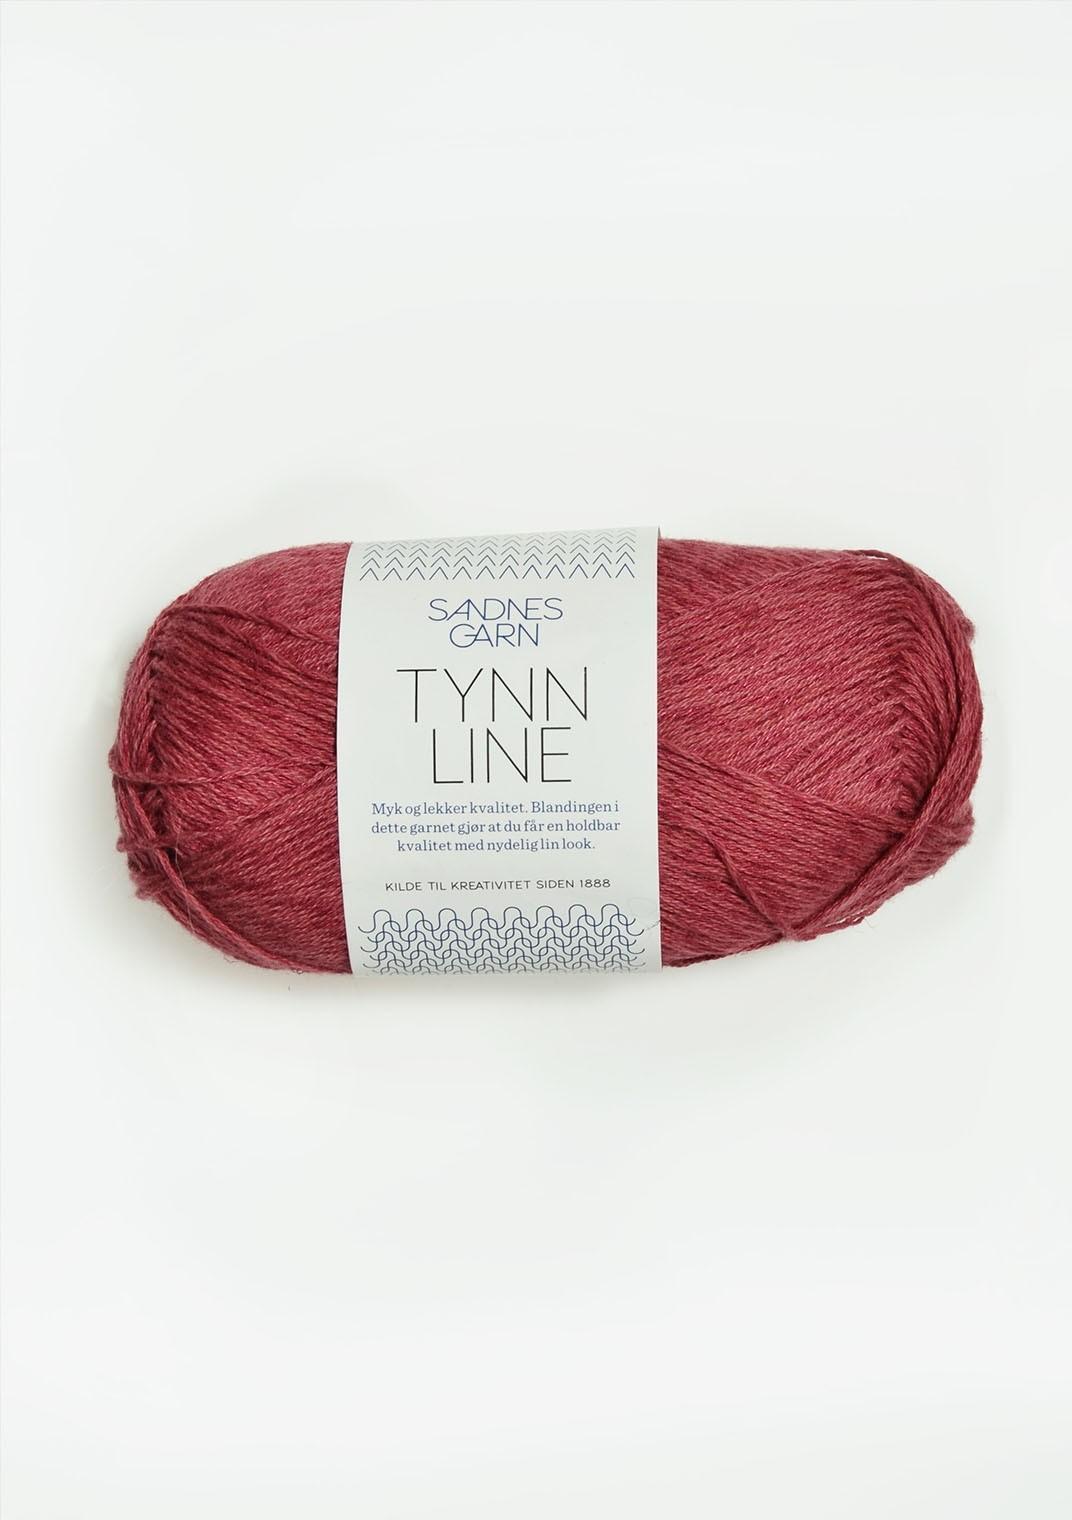 Tynn line 4335 hallonkräm